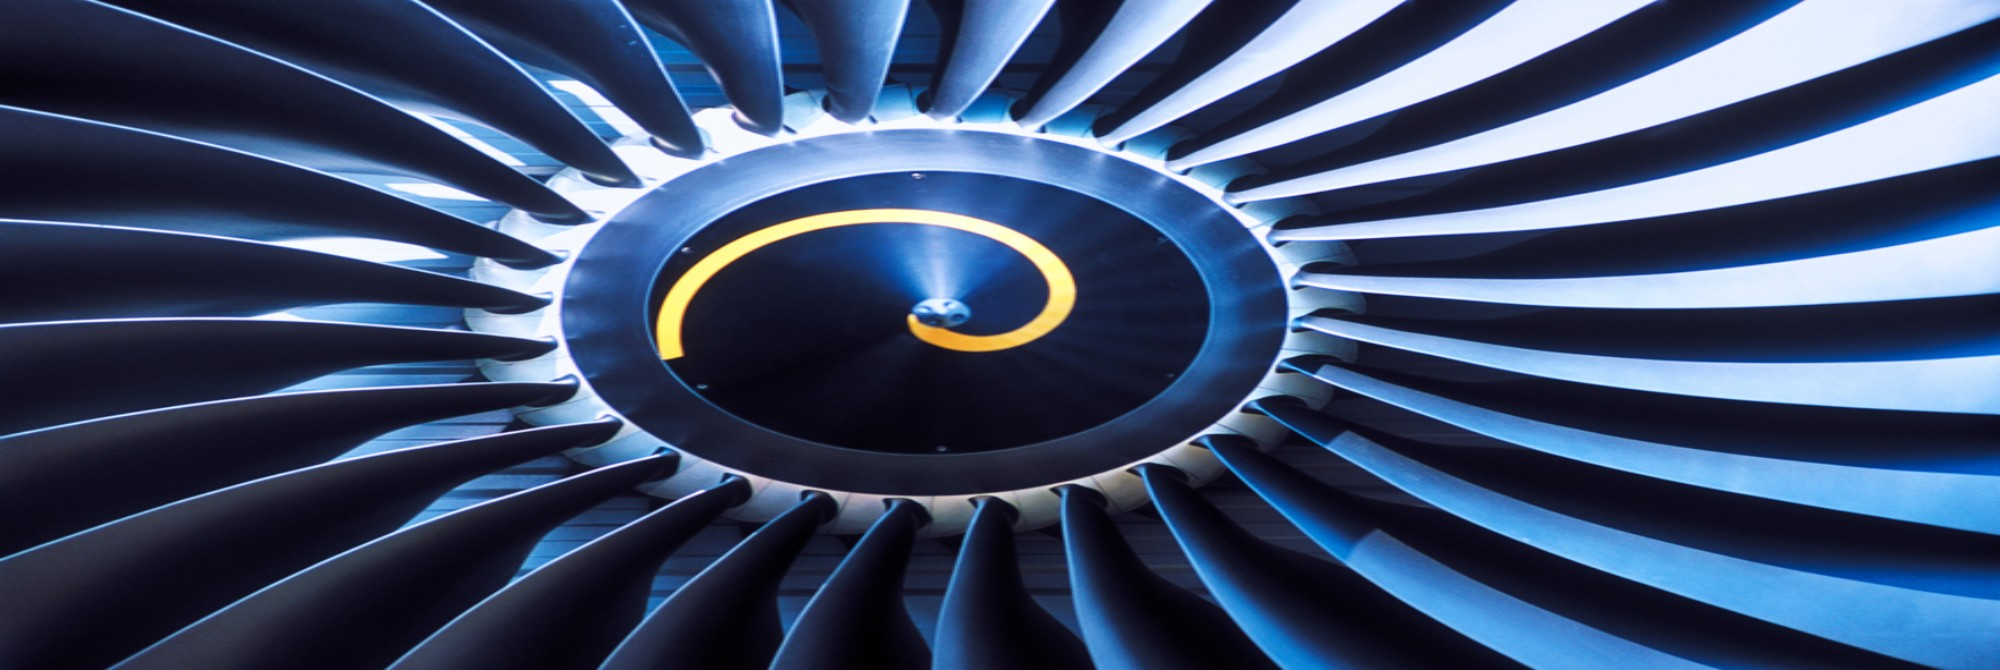 aerospace industry thyssenkrupp materials na